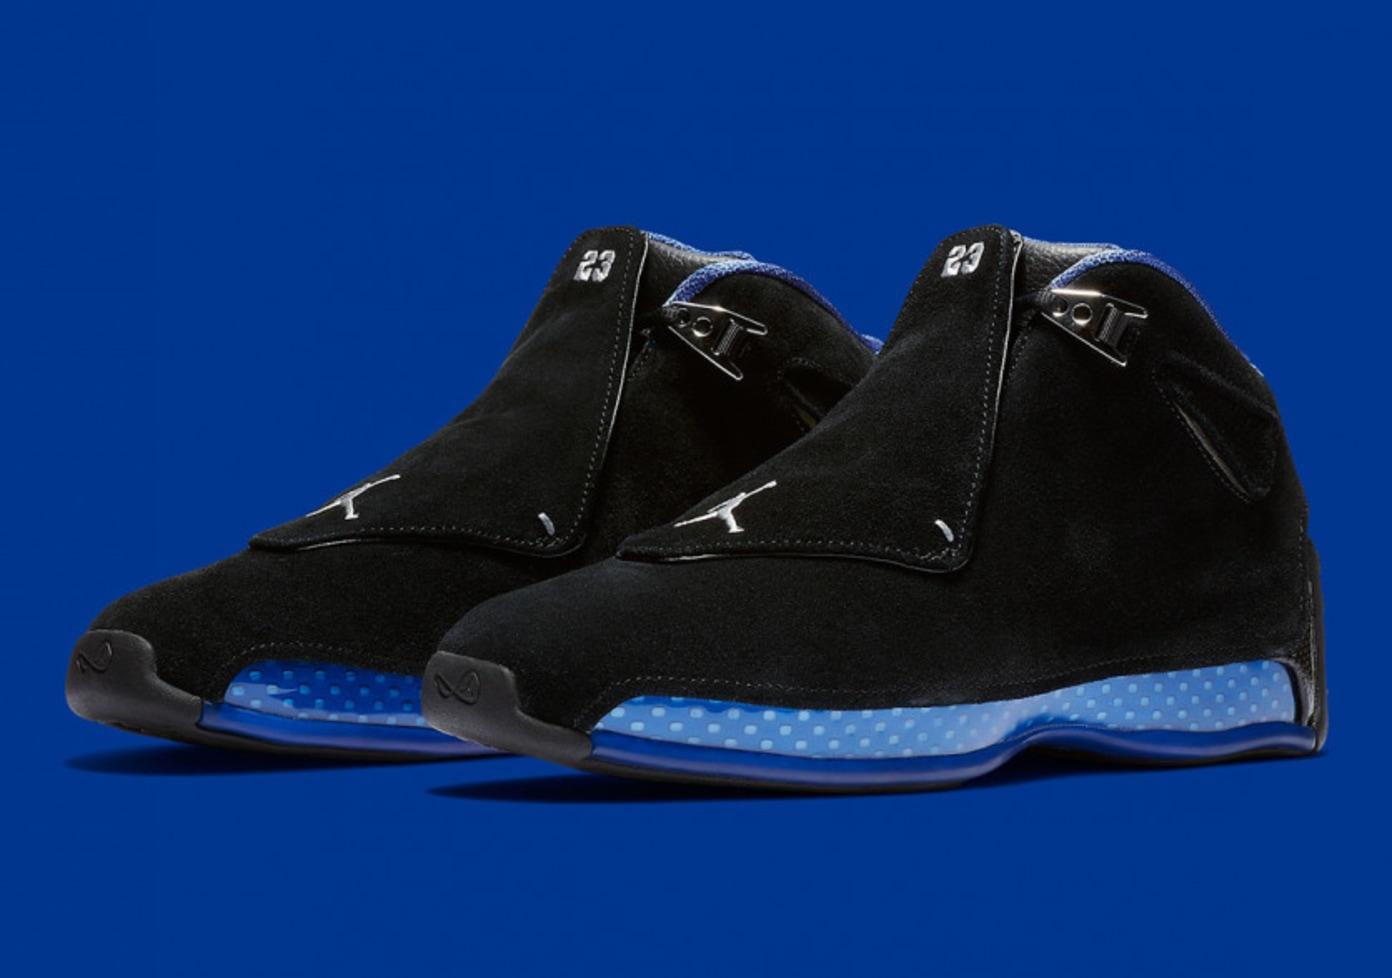 Nike Air Jordan 18 Retro - Black/Sport